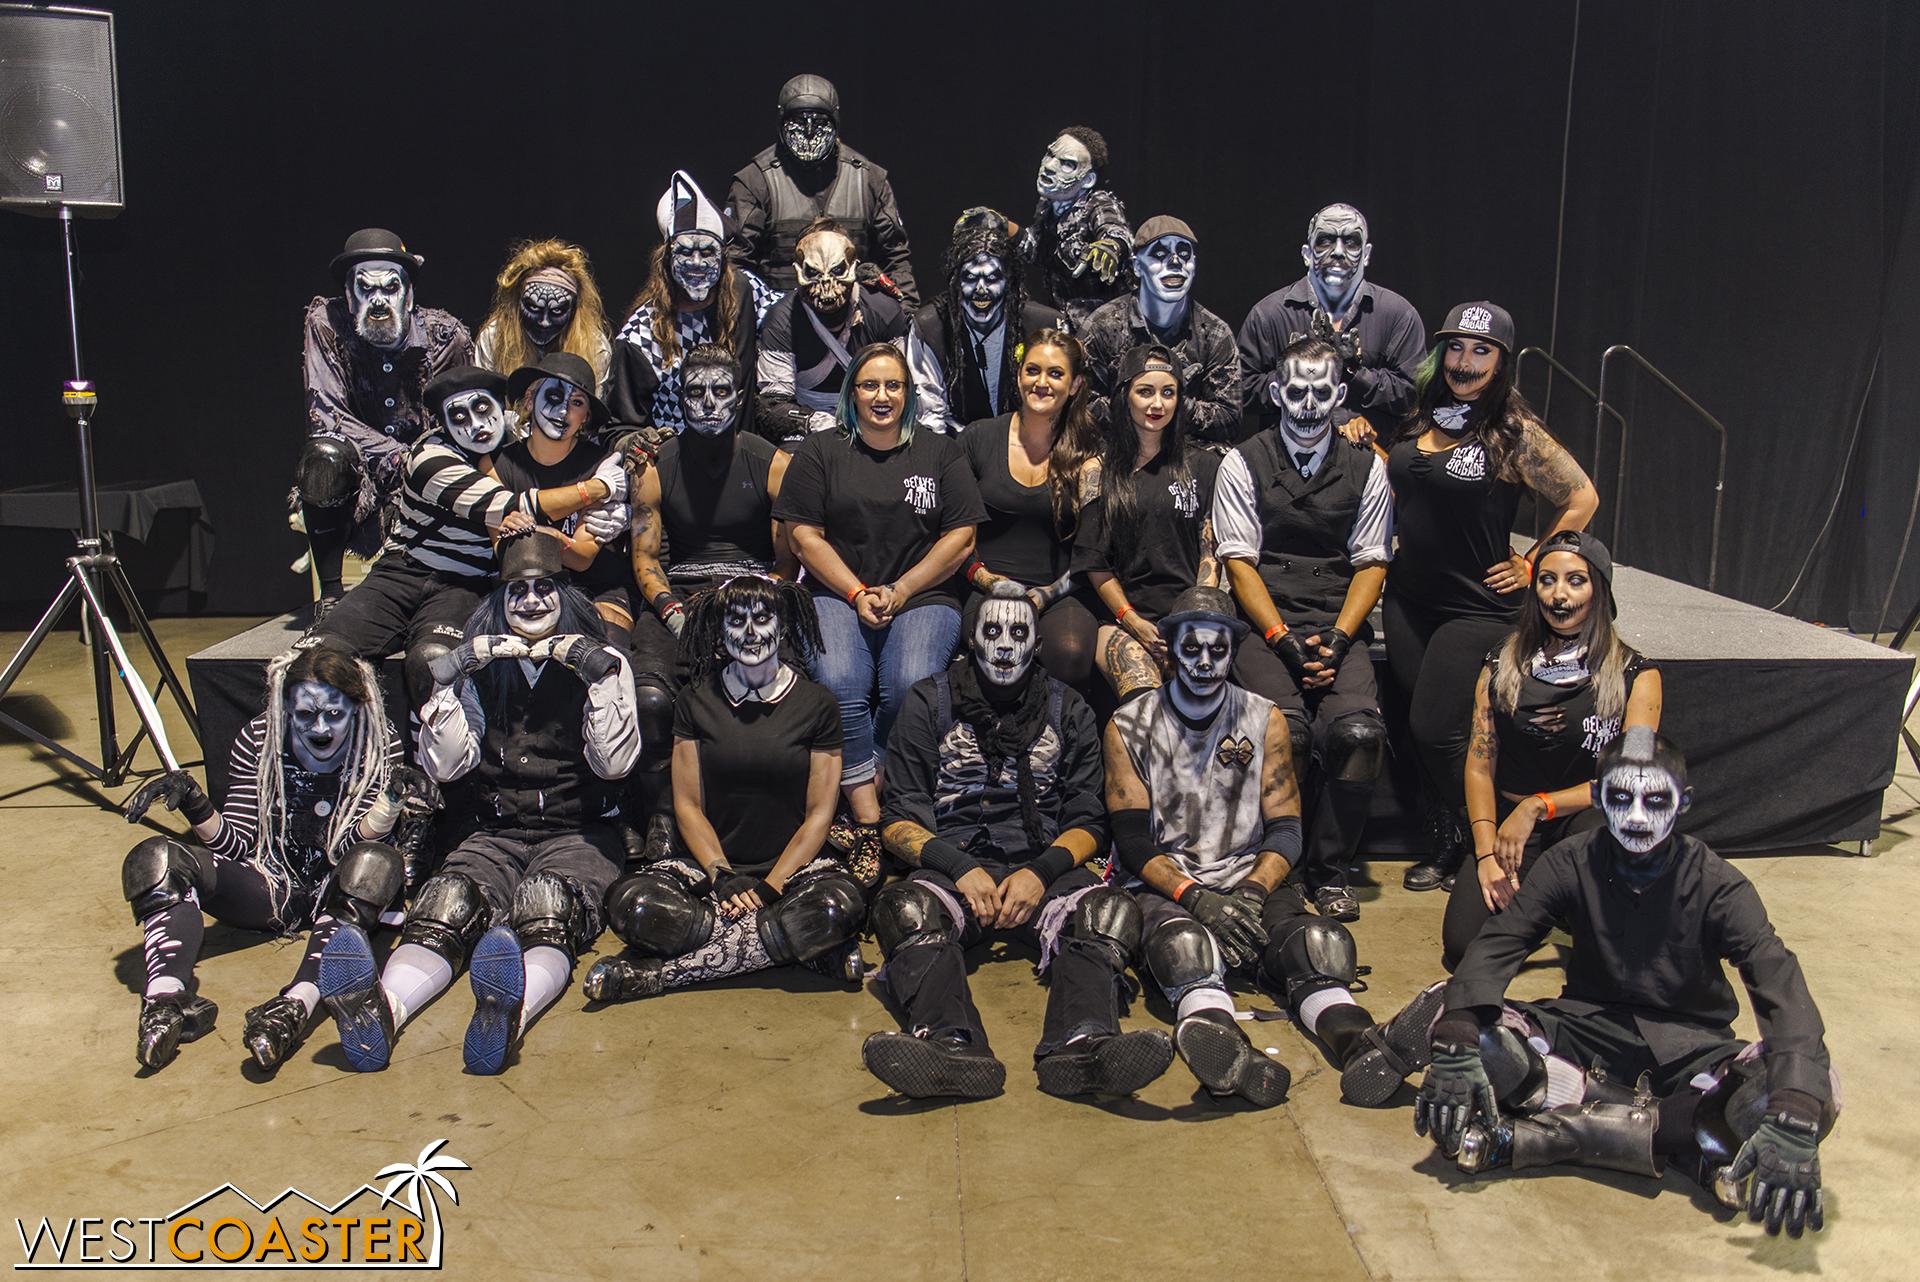 Decayed Brigade at Midsummer Scream.